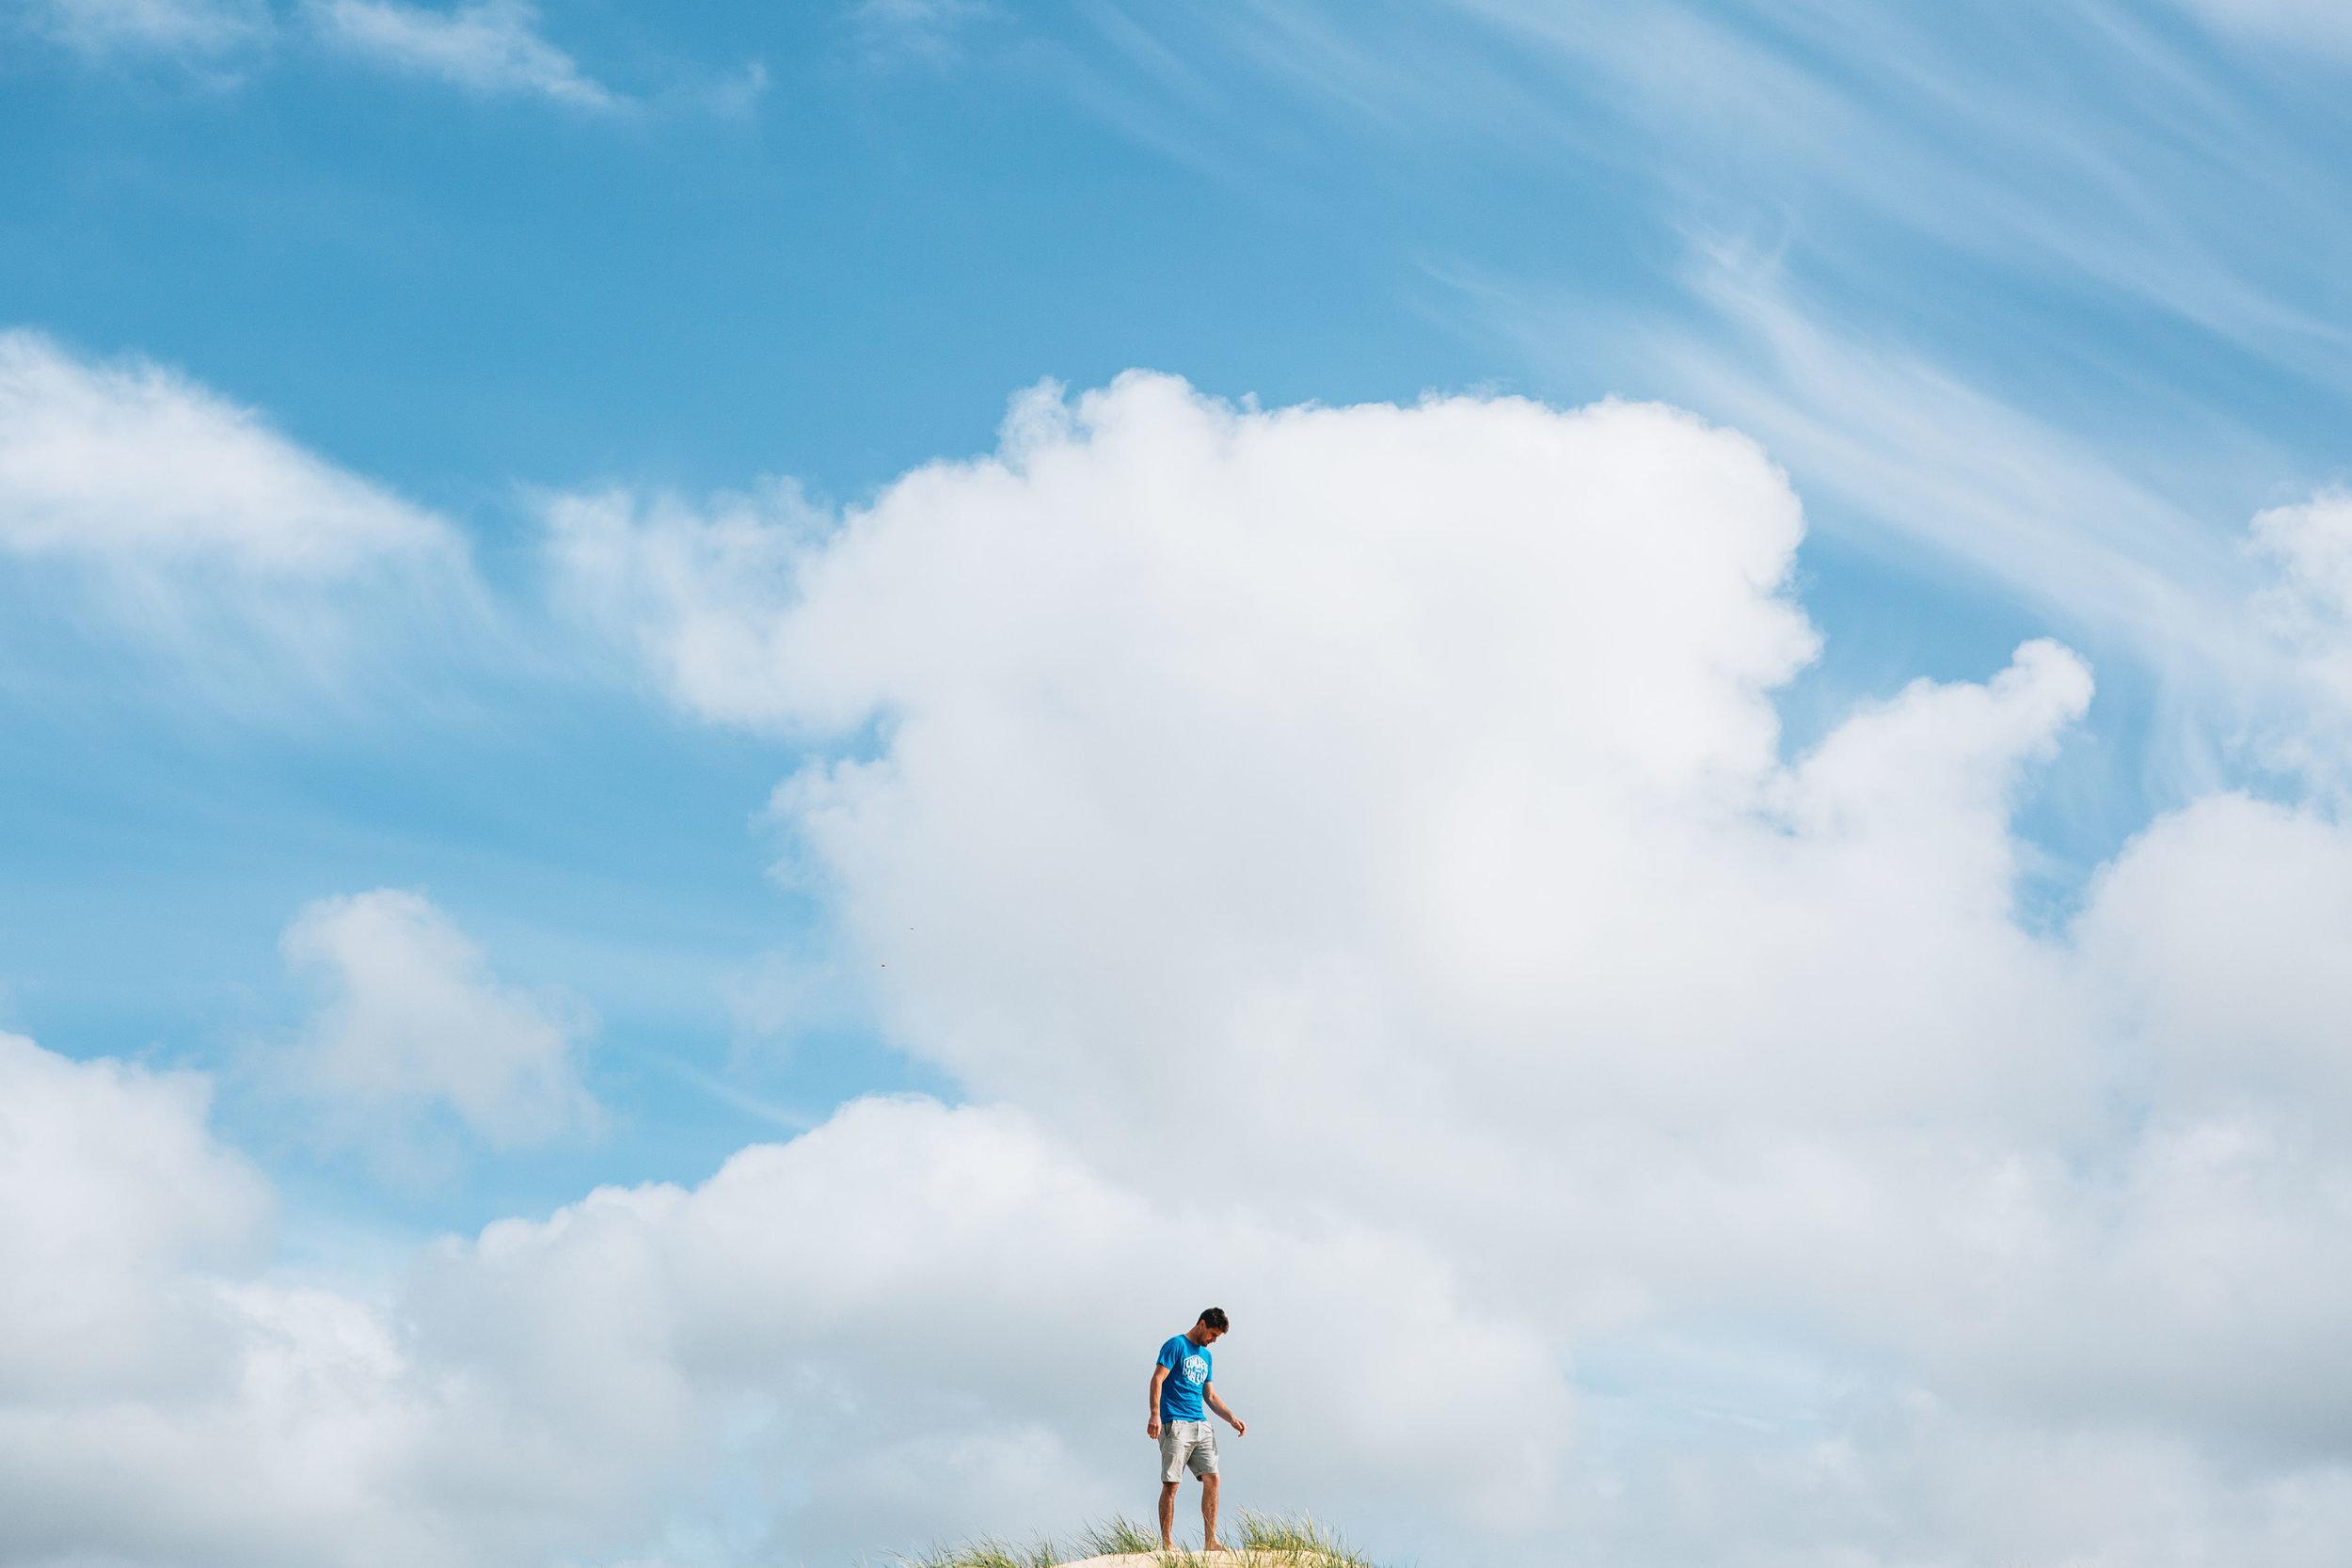 Rapanui_summer_brooke-27.jpg